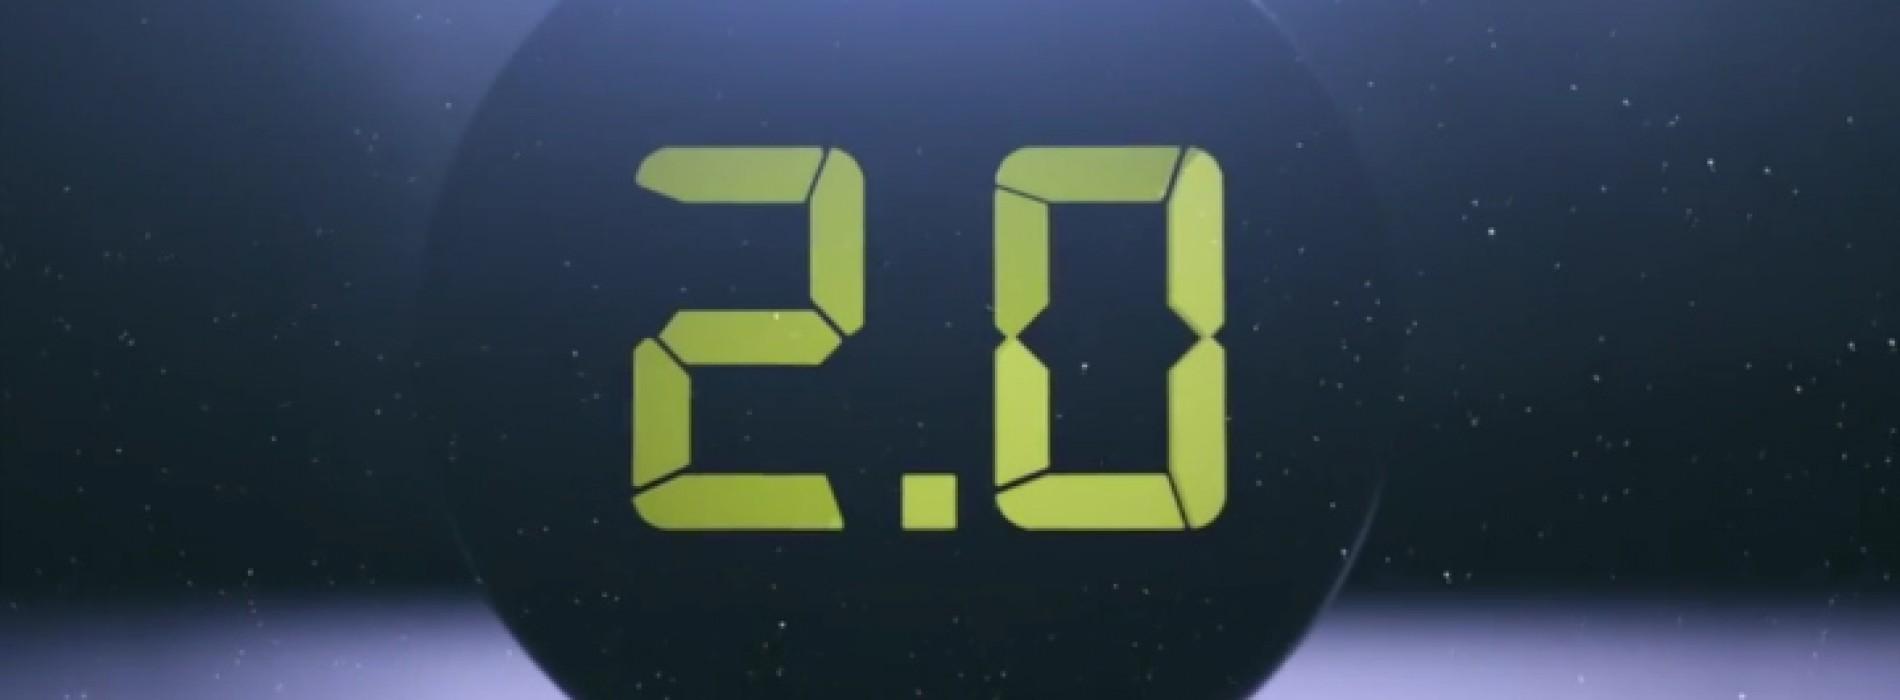 Orbotix intros faster, smarter, brighter Sphero 2.0